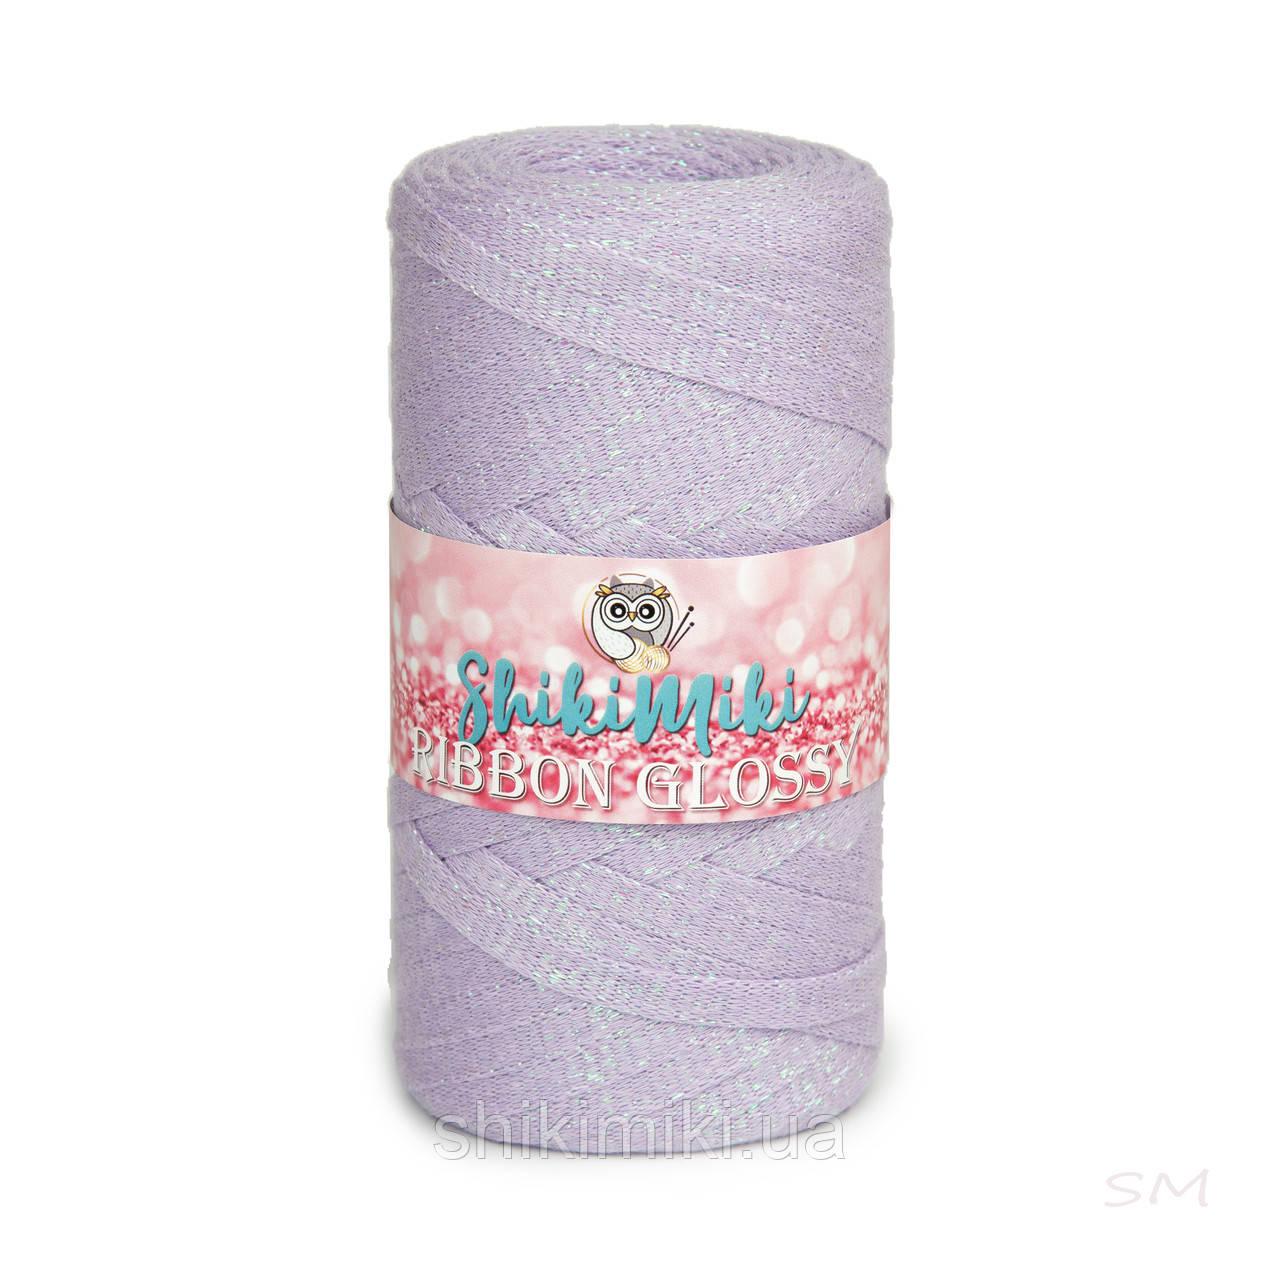 Трикотажный плоский шнур Ribbon Glossy, цвет Сиреневый